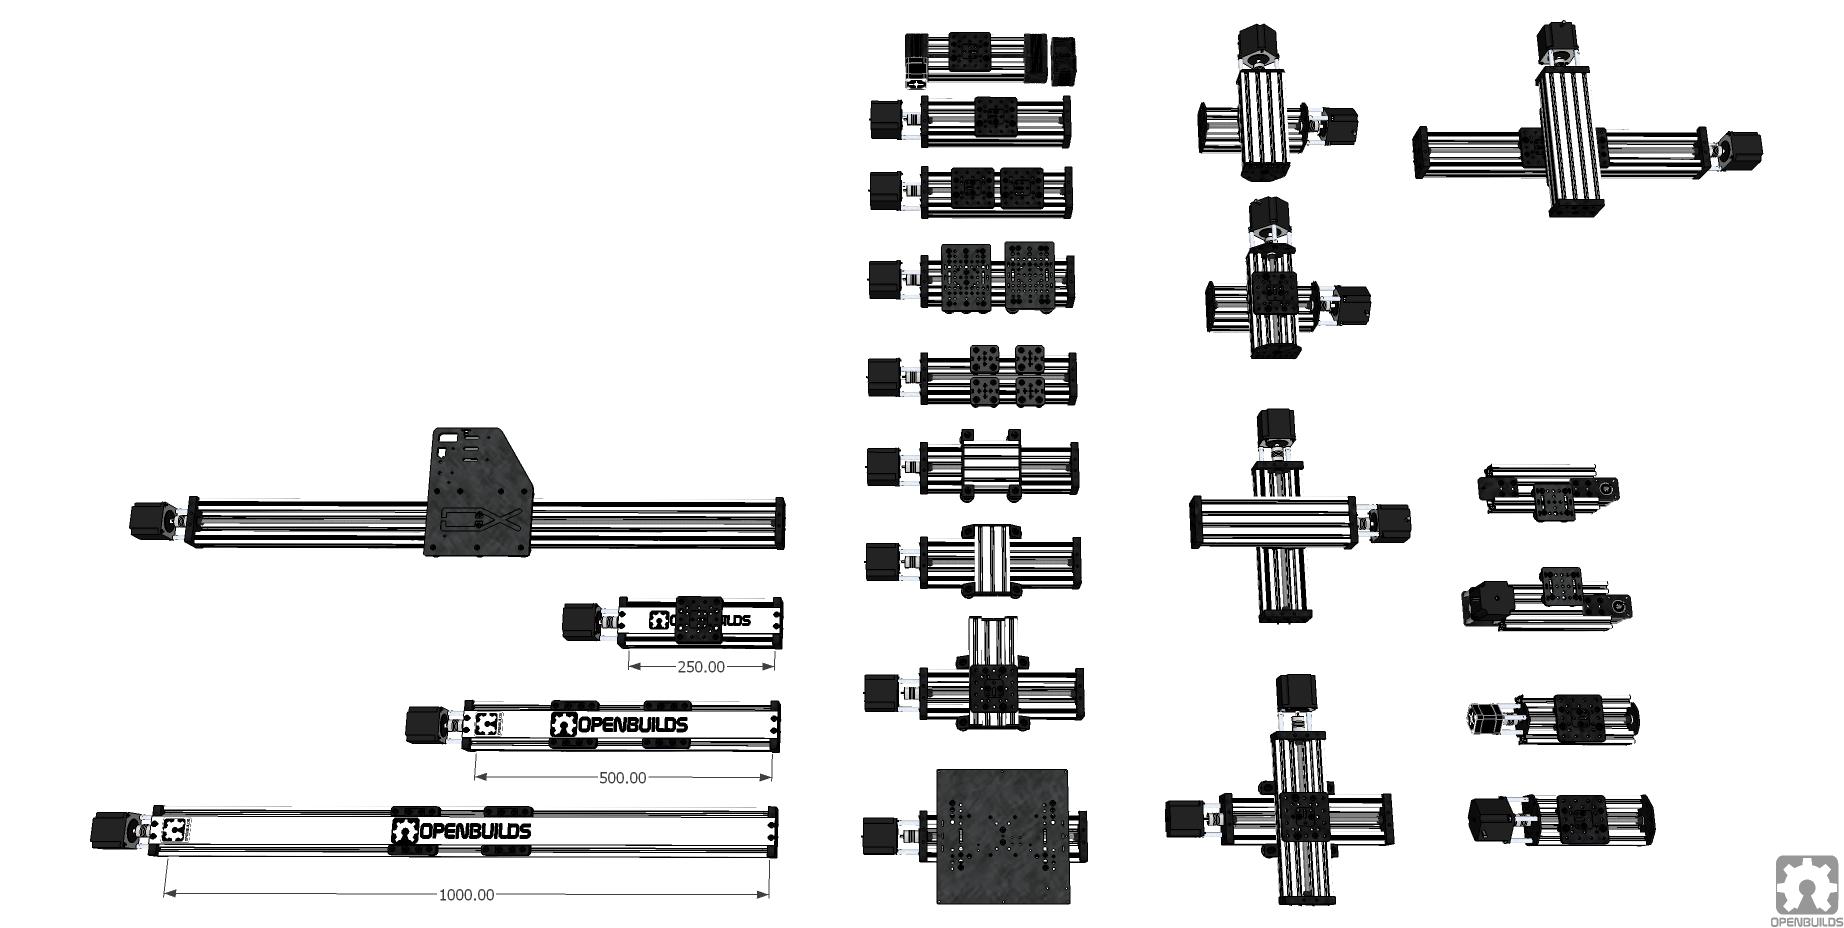 cbeam-openbuilds-example-models-3.jpg